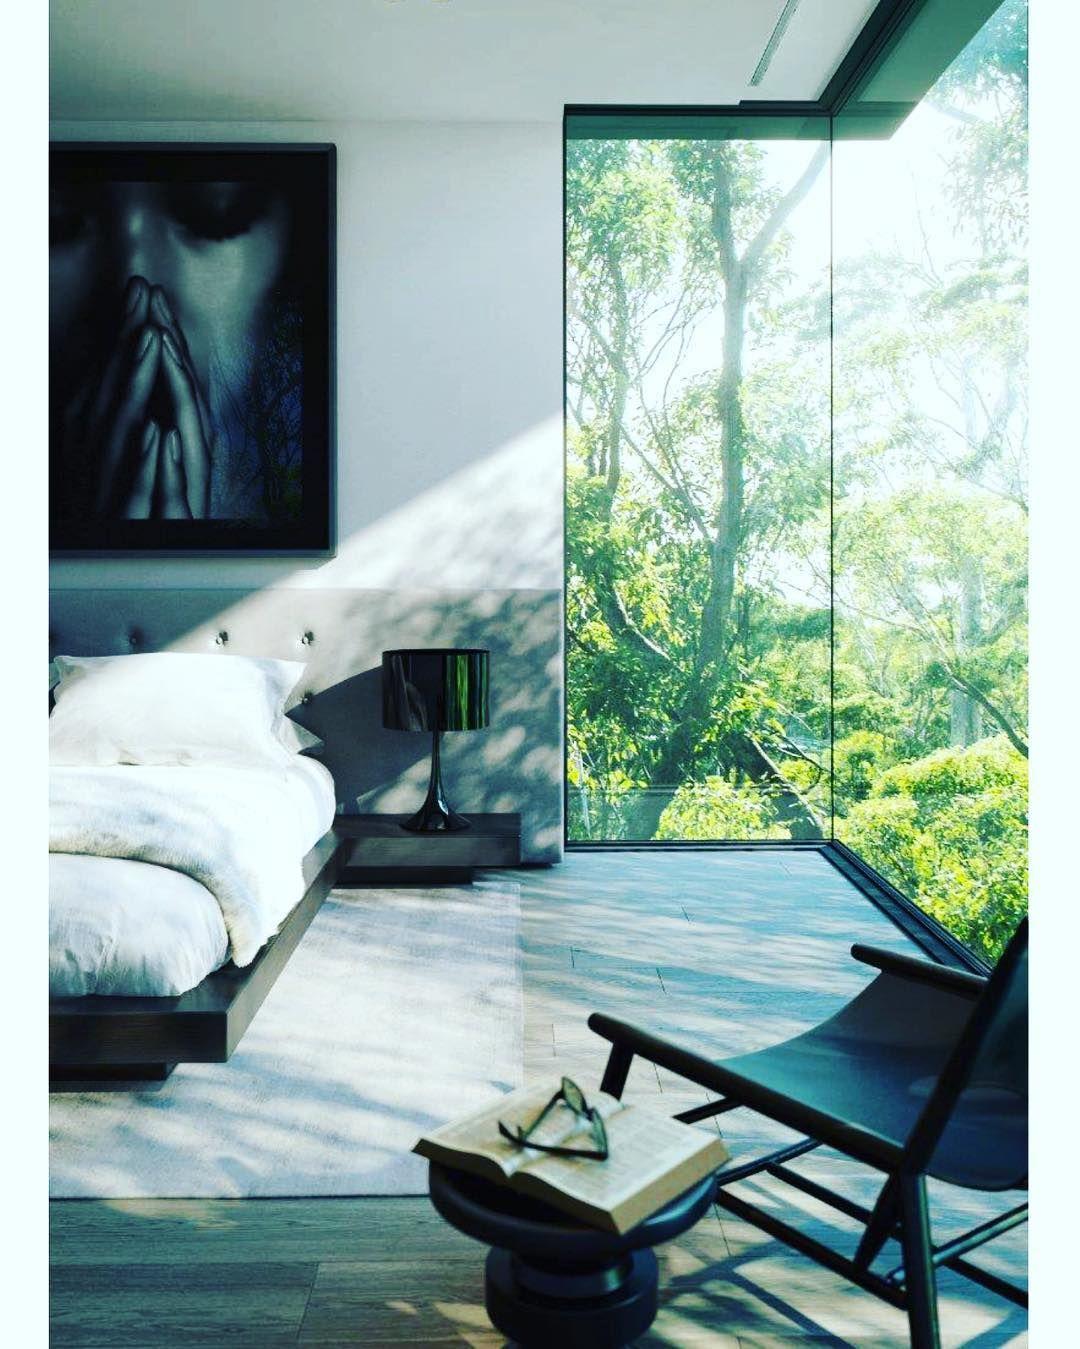 Pin By Laraine Hurter On Wellbeing Spaces In 2020 Bedroom Views Interior Design Elegant Interior Design